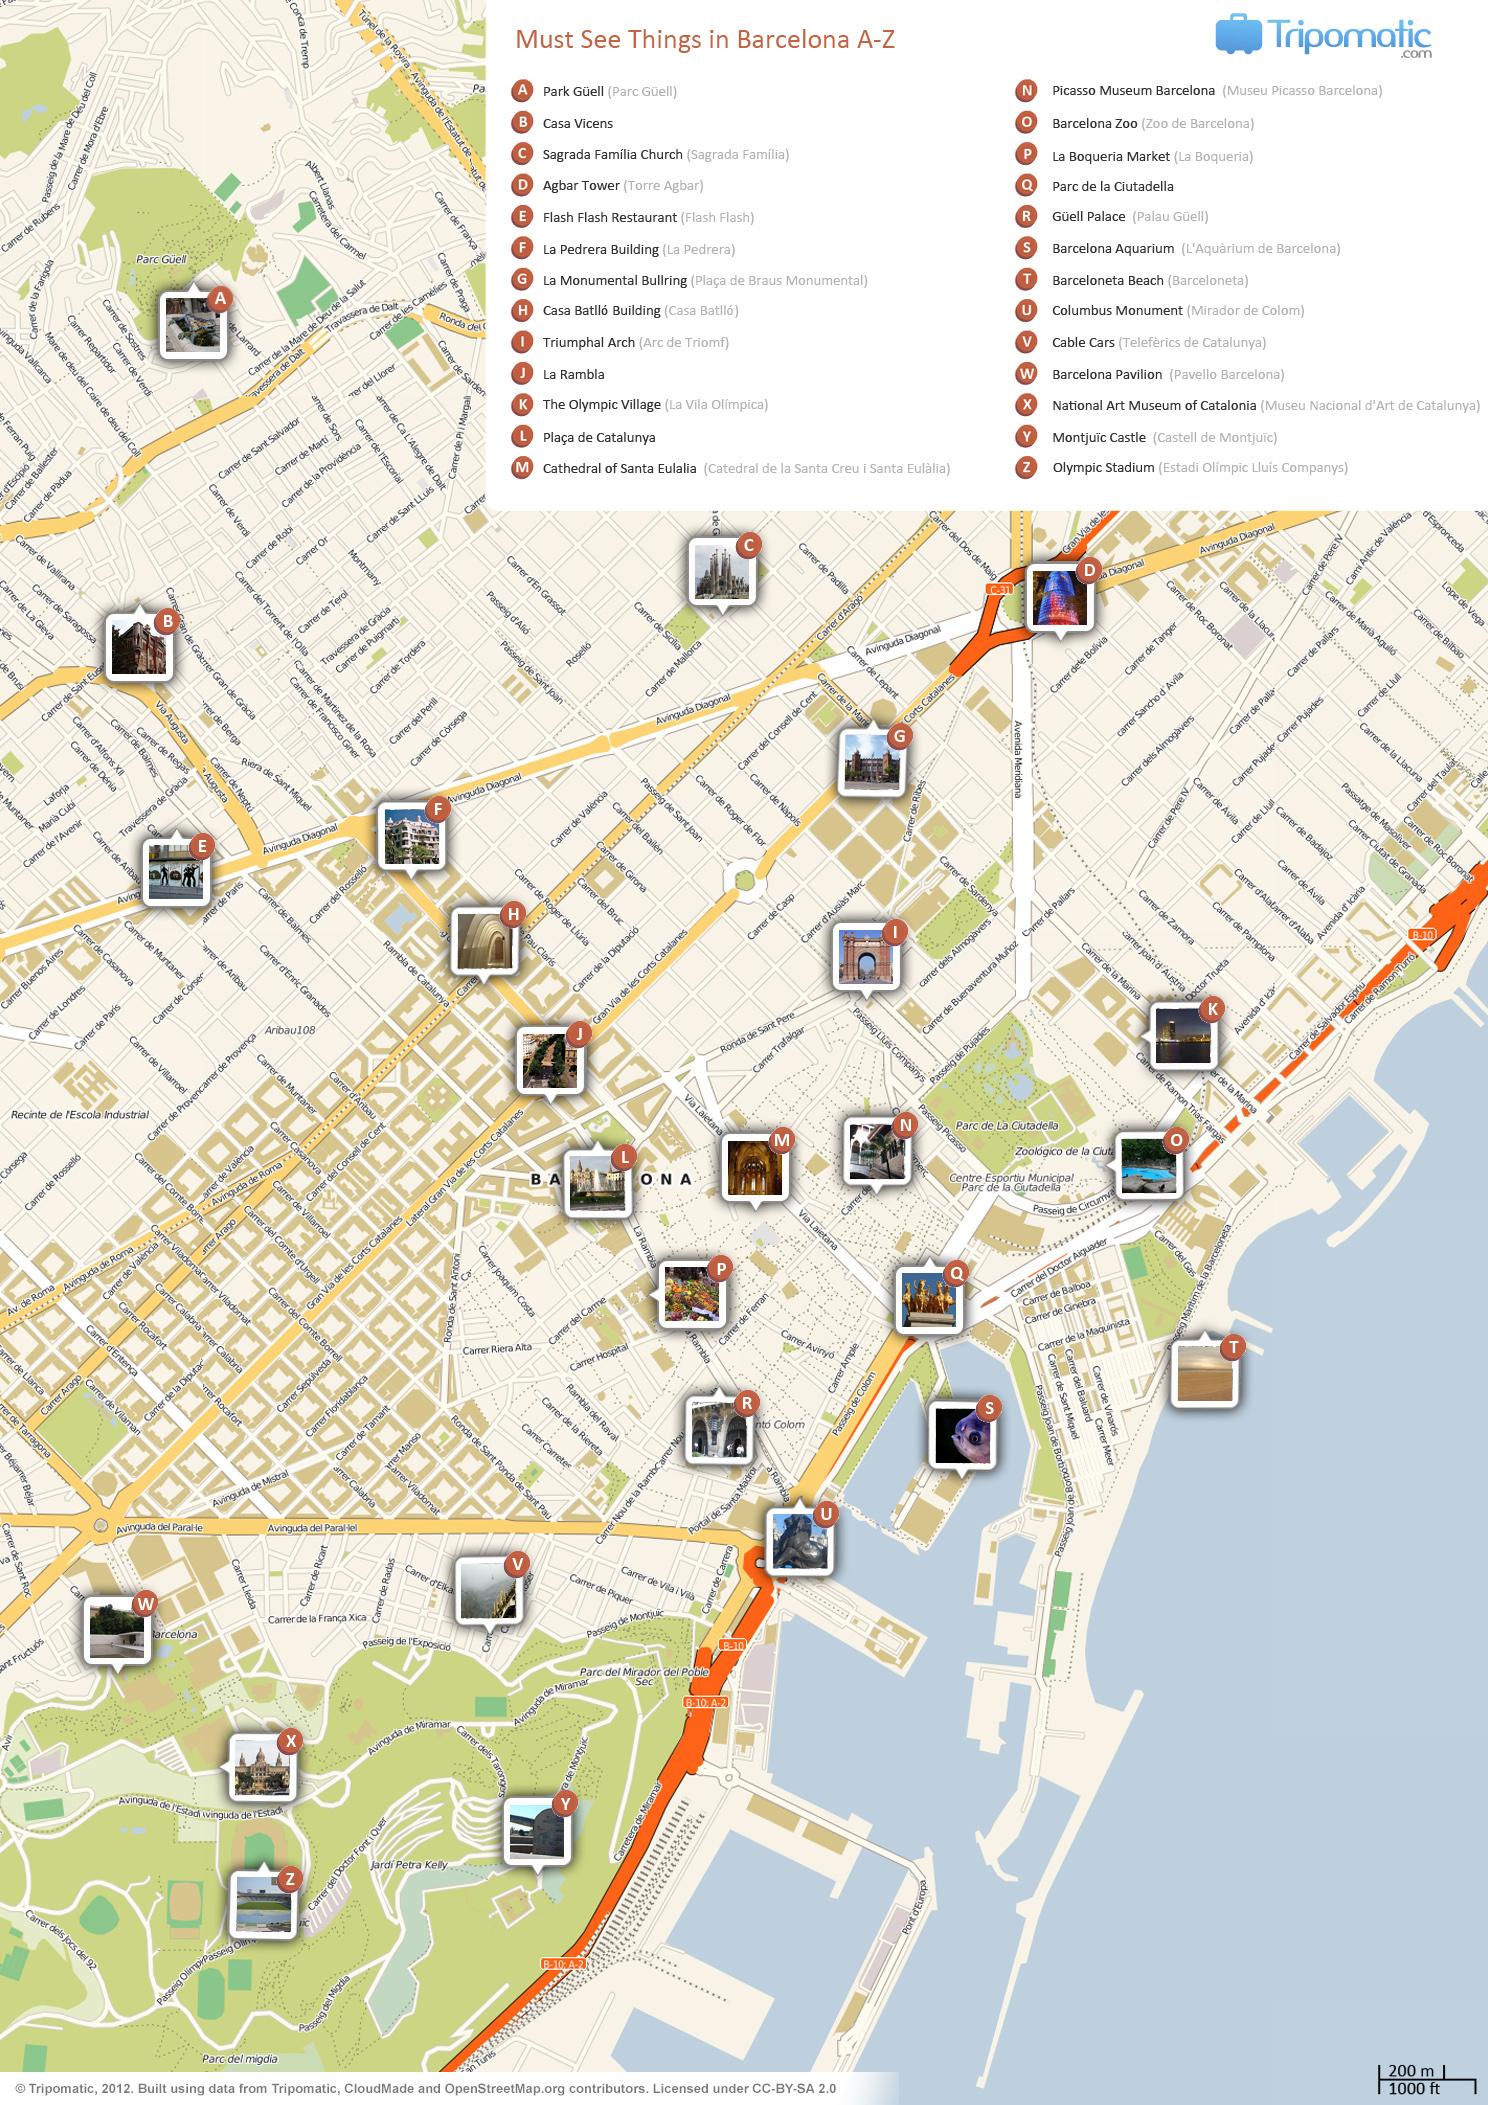 Barcelona Printable Tourist Attractions Map